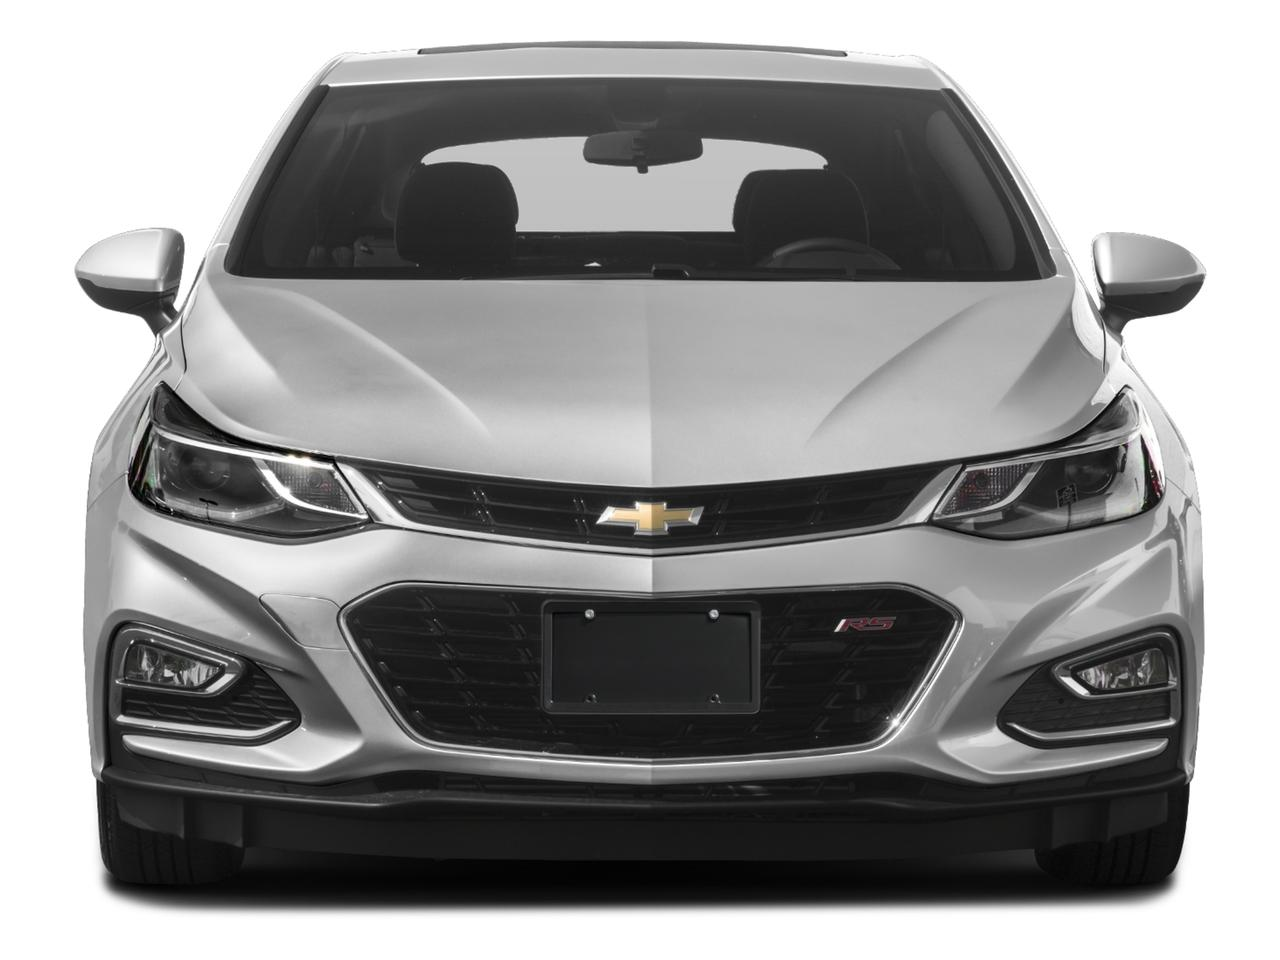 Statesville Silver Ice Metallic 2017 Chevrolet Cruze: Used ...